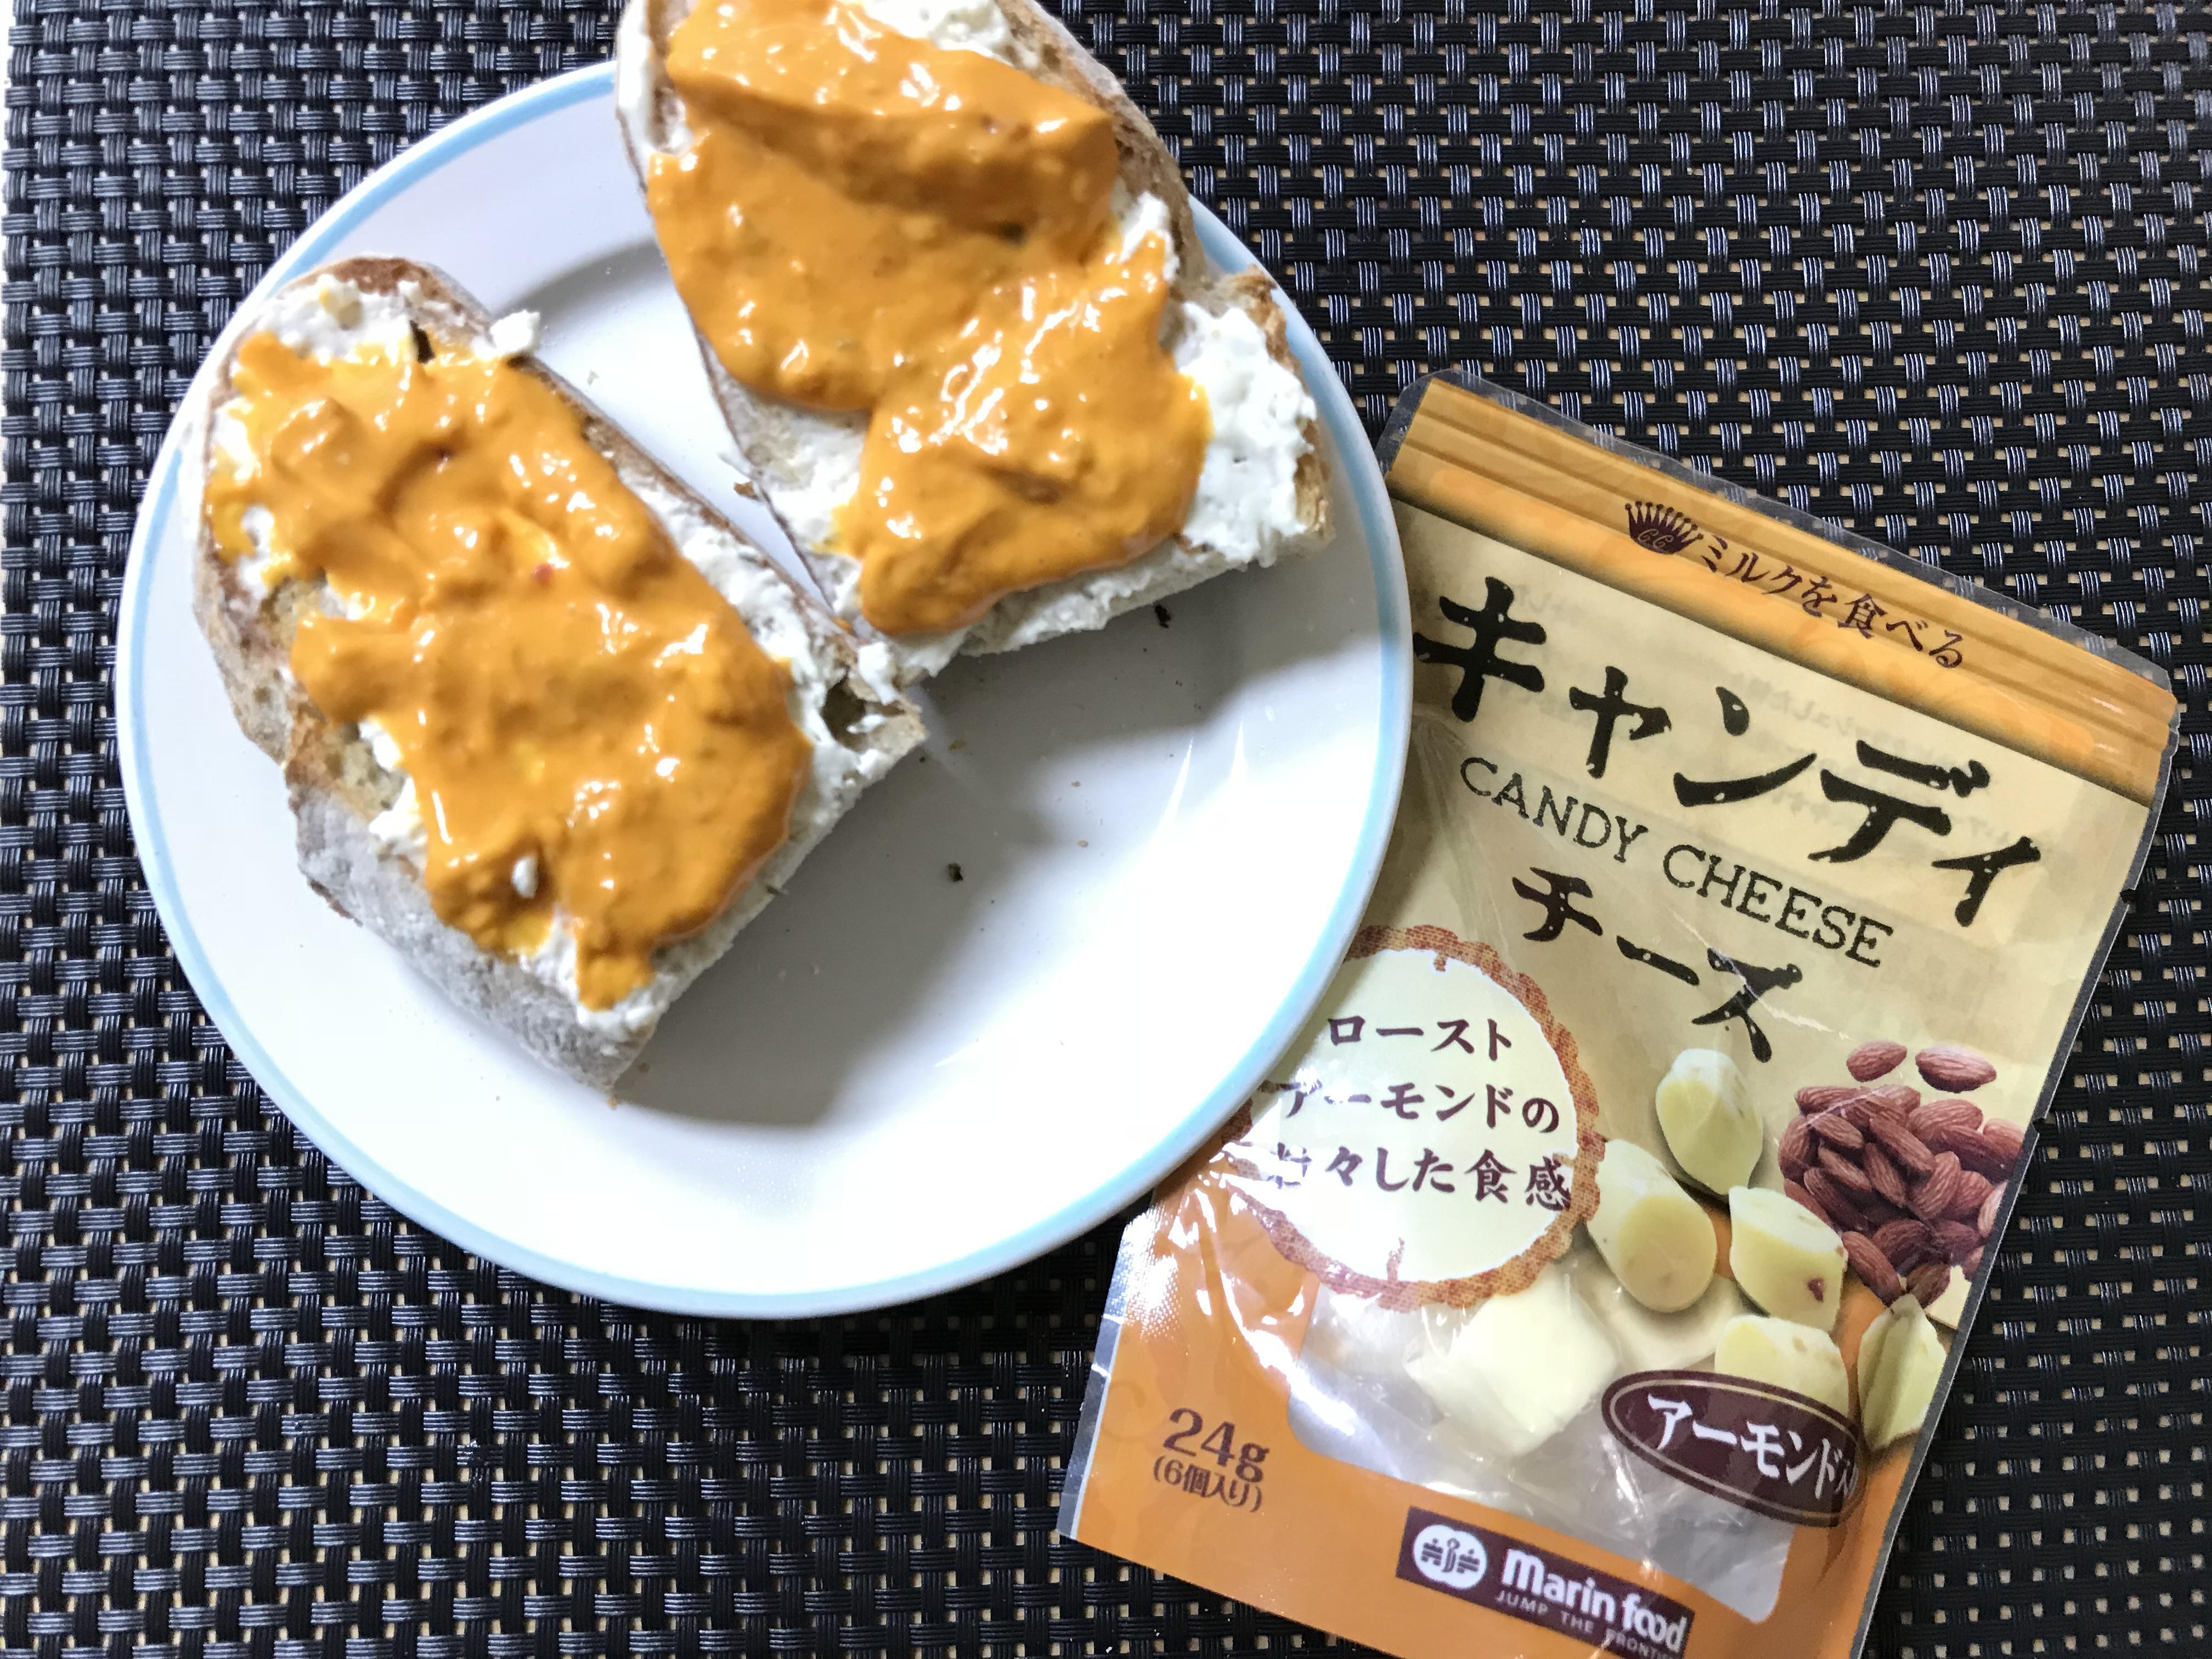 [Marin food]캔디타입 치즈 아몬드